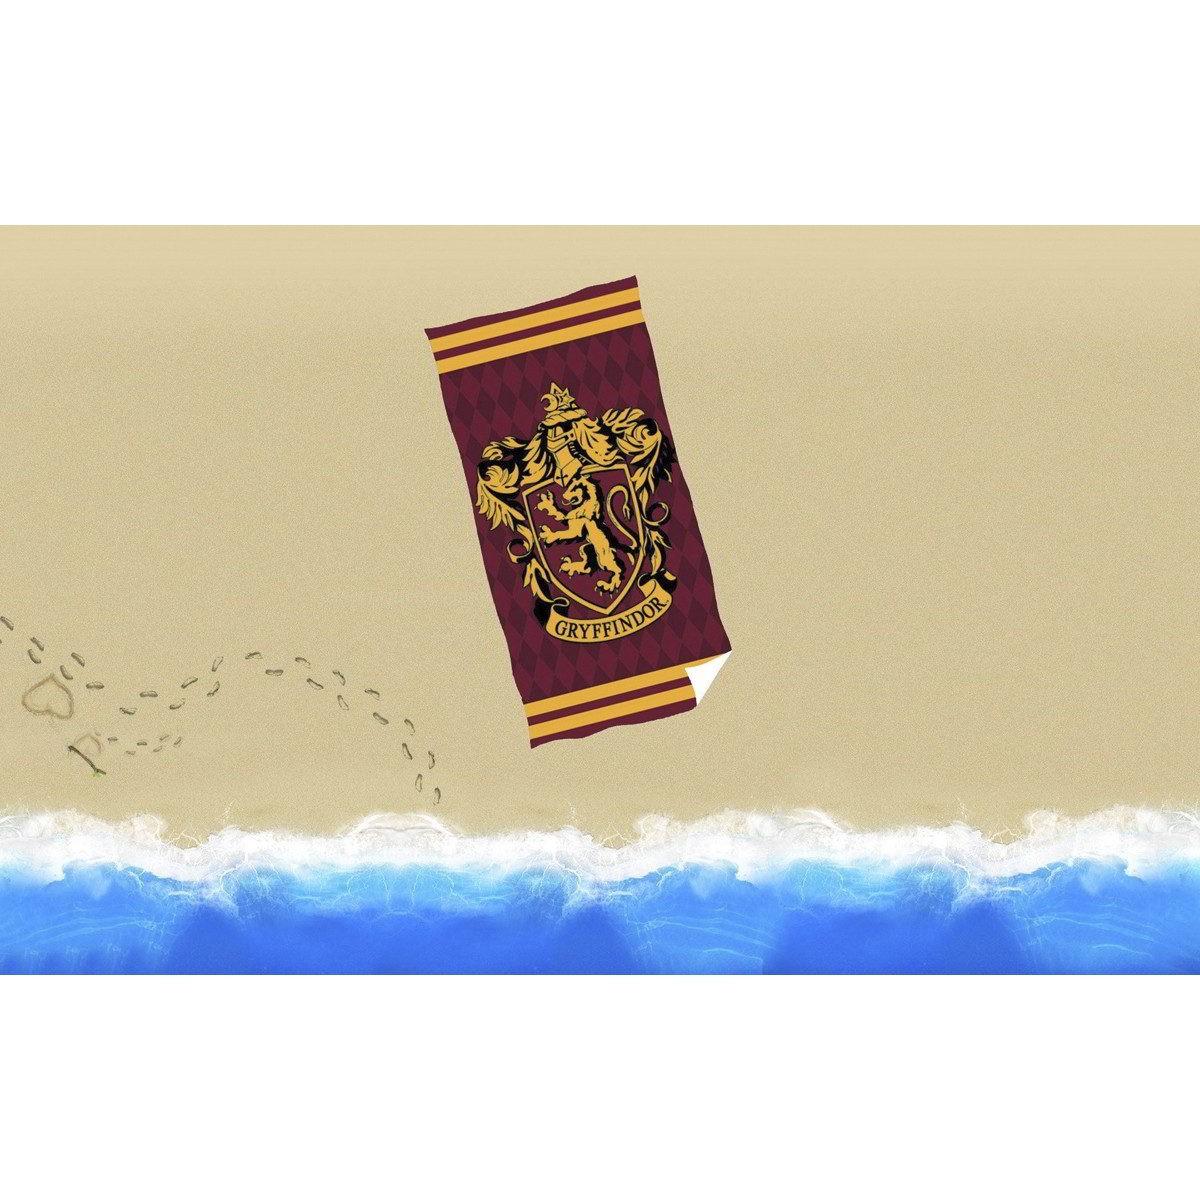 Toalla de Ba/ño Playa Piscina Harry Potter 140 x 70 cm Estilo Kawaii